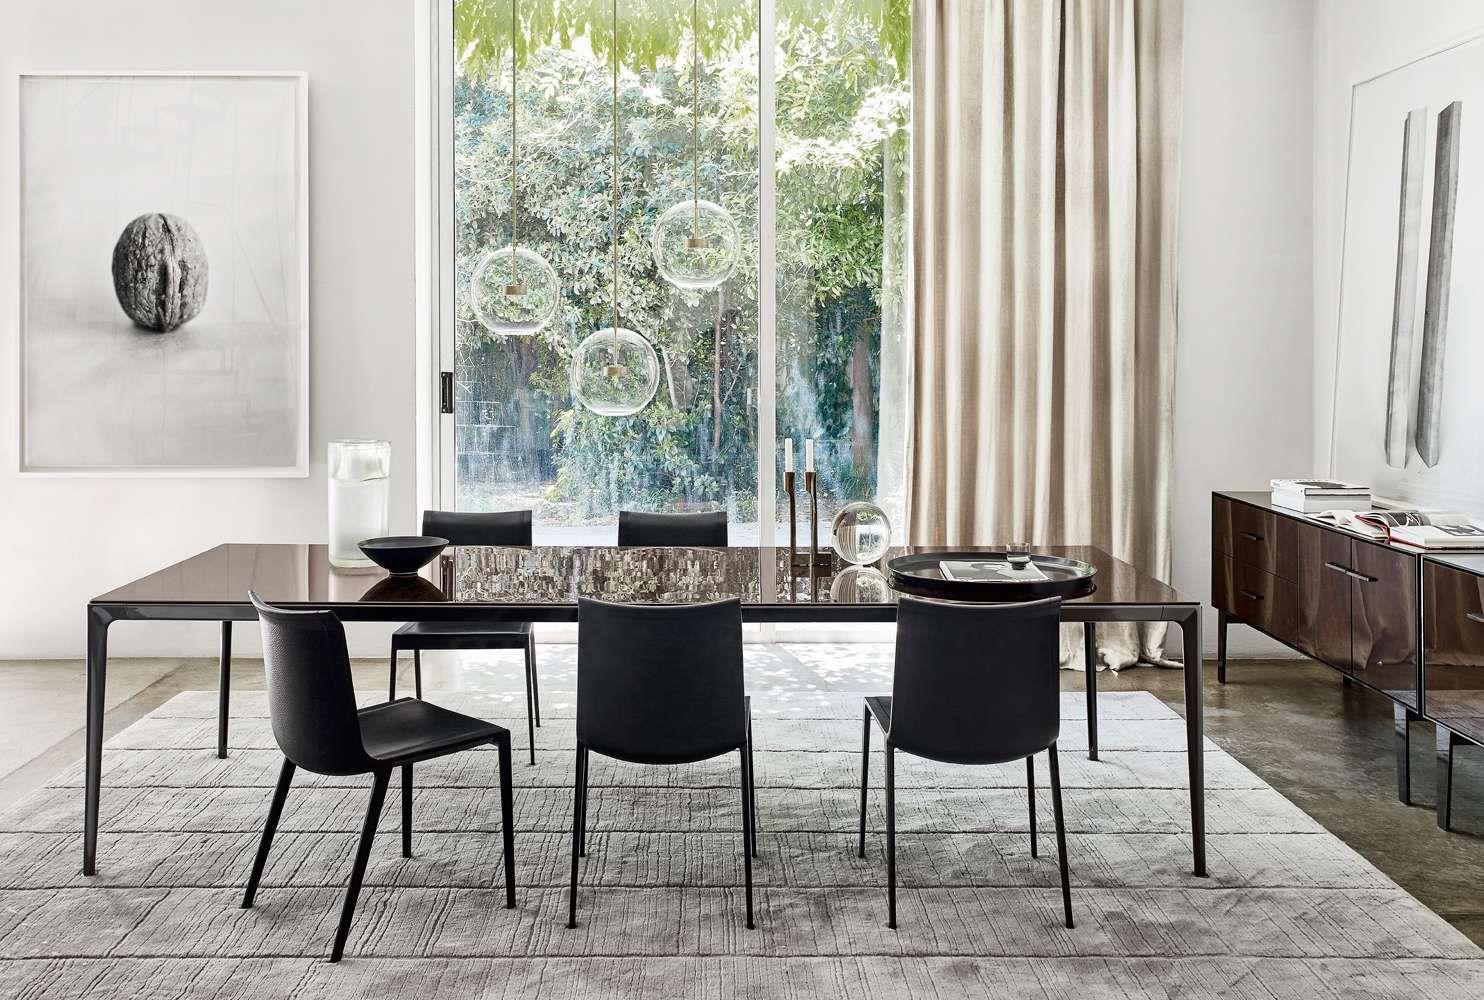 Mirto  B&b Italia  H&h Dubai  Furniture  Dining Tables Interesting Dining Room Furniture Dubai Inspiration Design